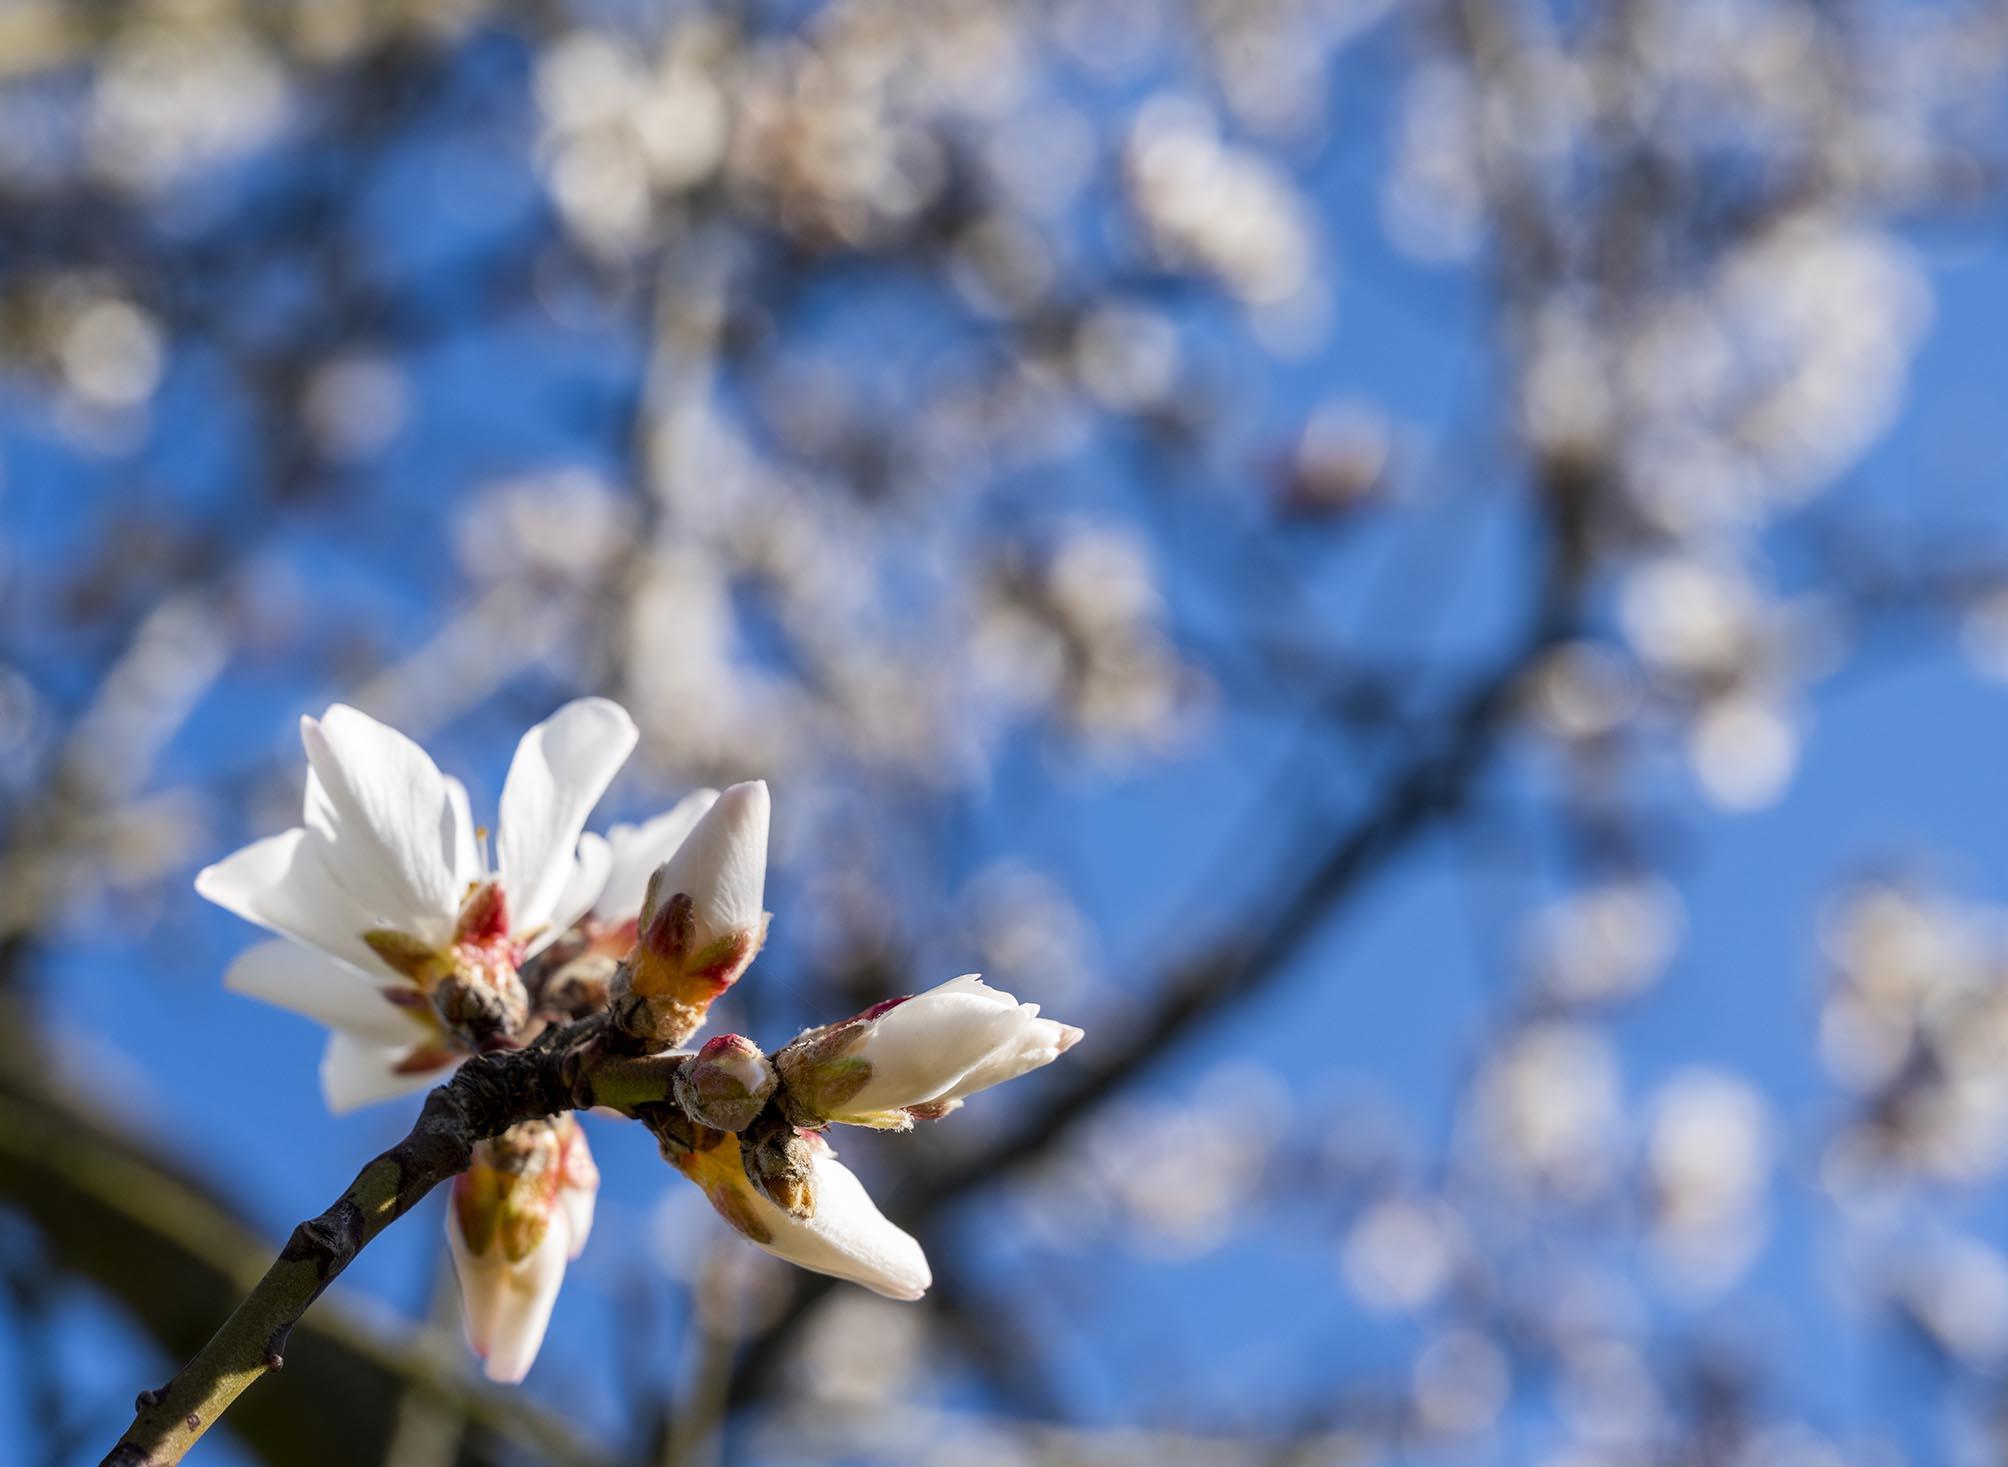 Großaufnahme einer Mandelblüte vor strahlend blauem Frühlingshimmel